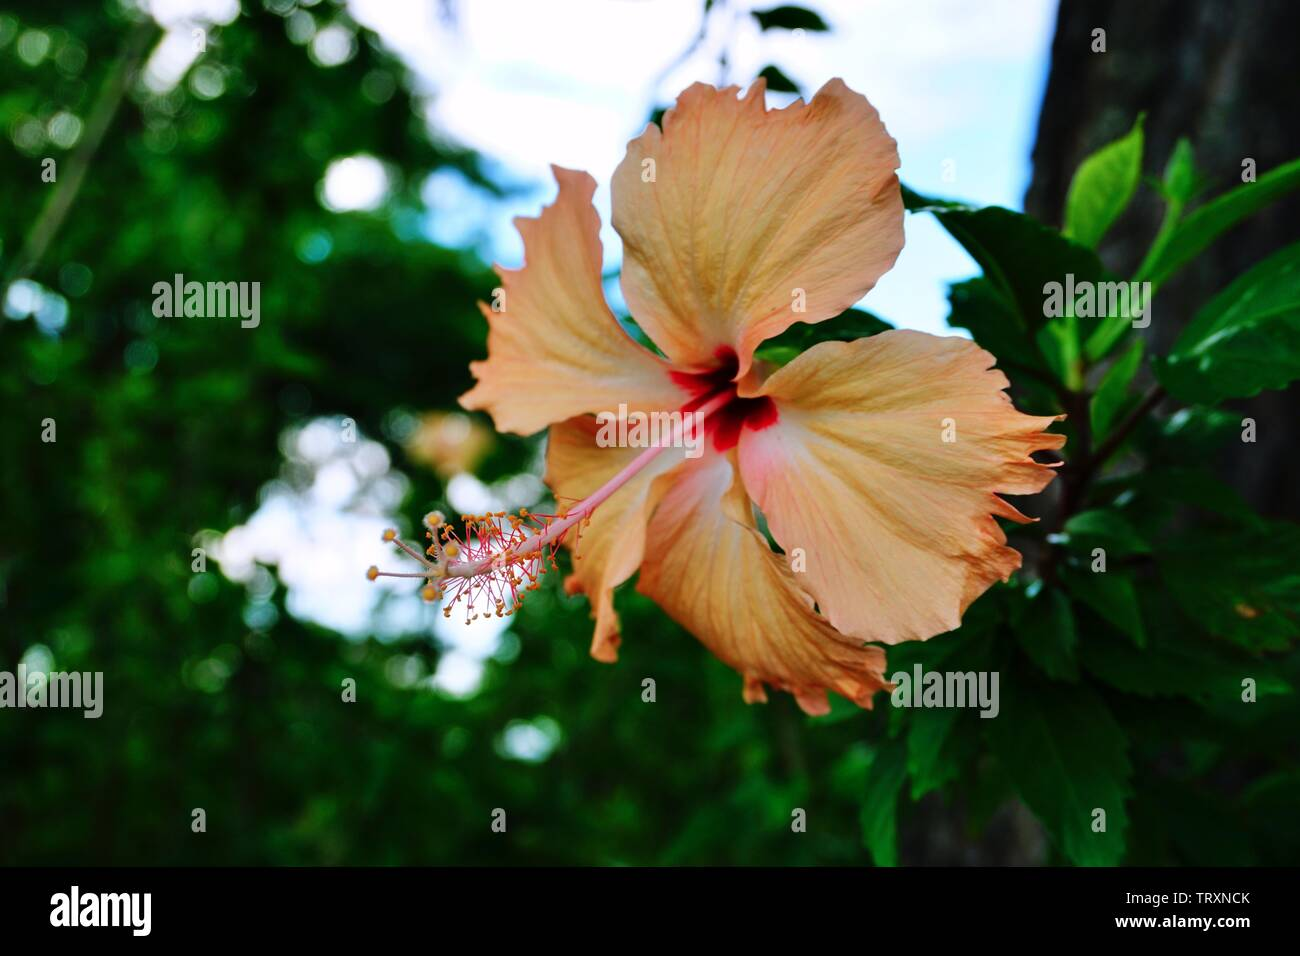 Peach Hibiscus Flower Stock Photos Peach Hibiscus Flower Stock